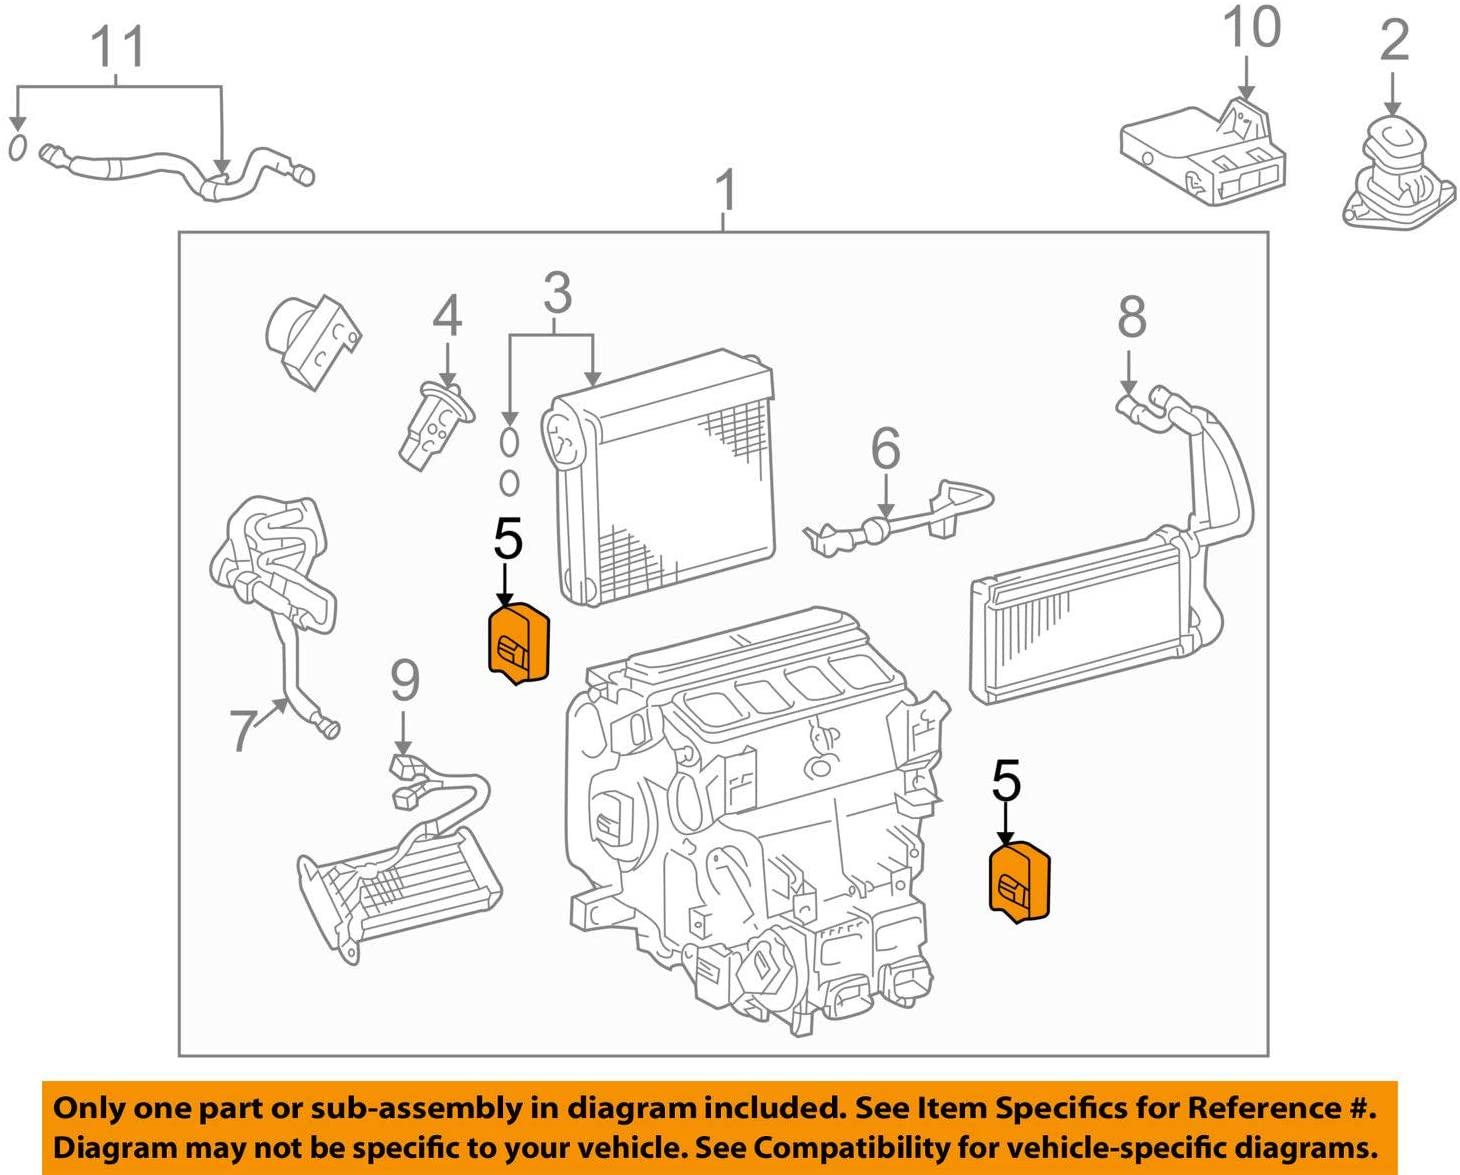 Toyota 87106-60270 Air Conditioner Radiator Damper Servo Sub Assembly